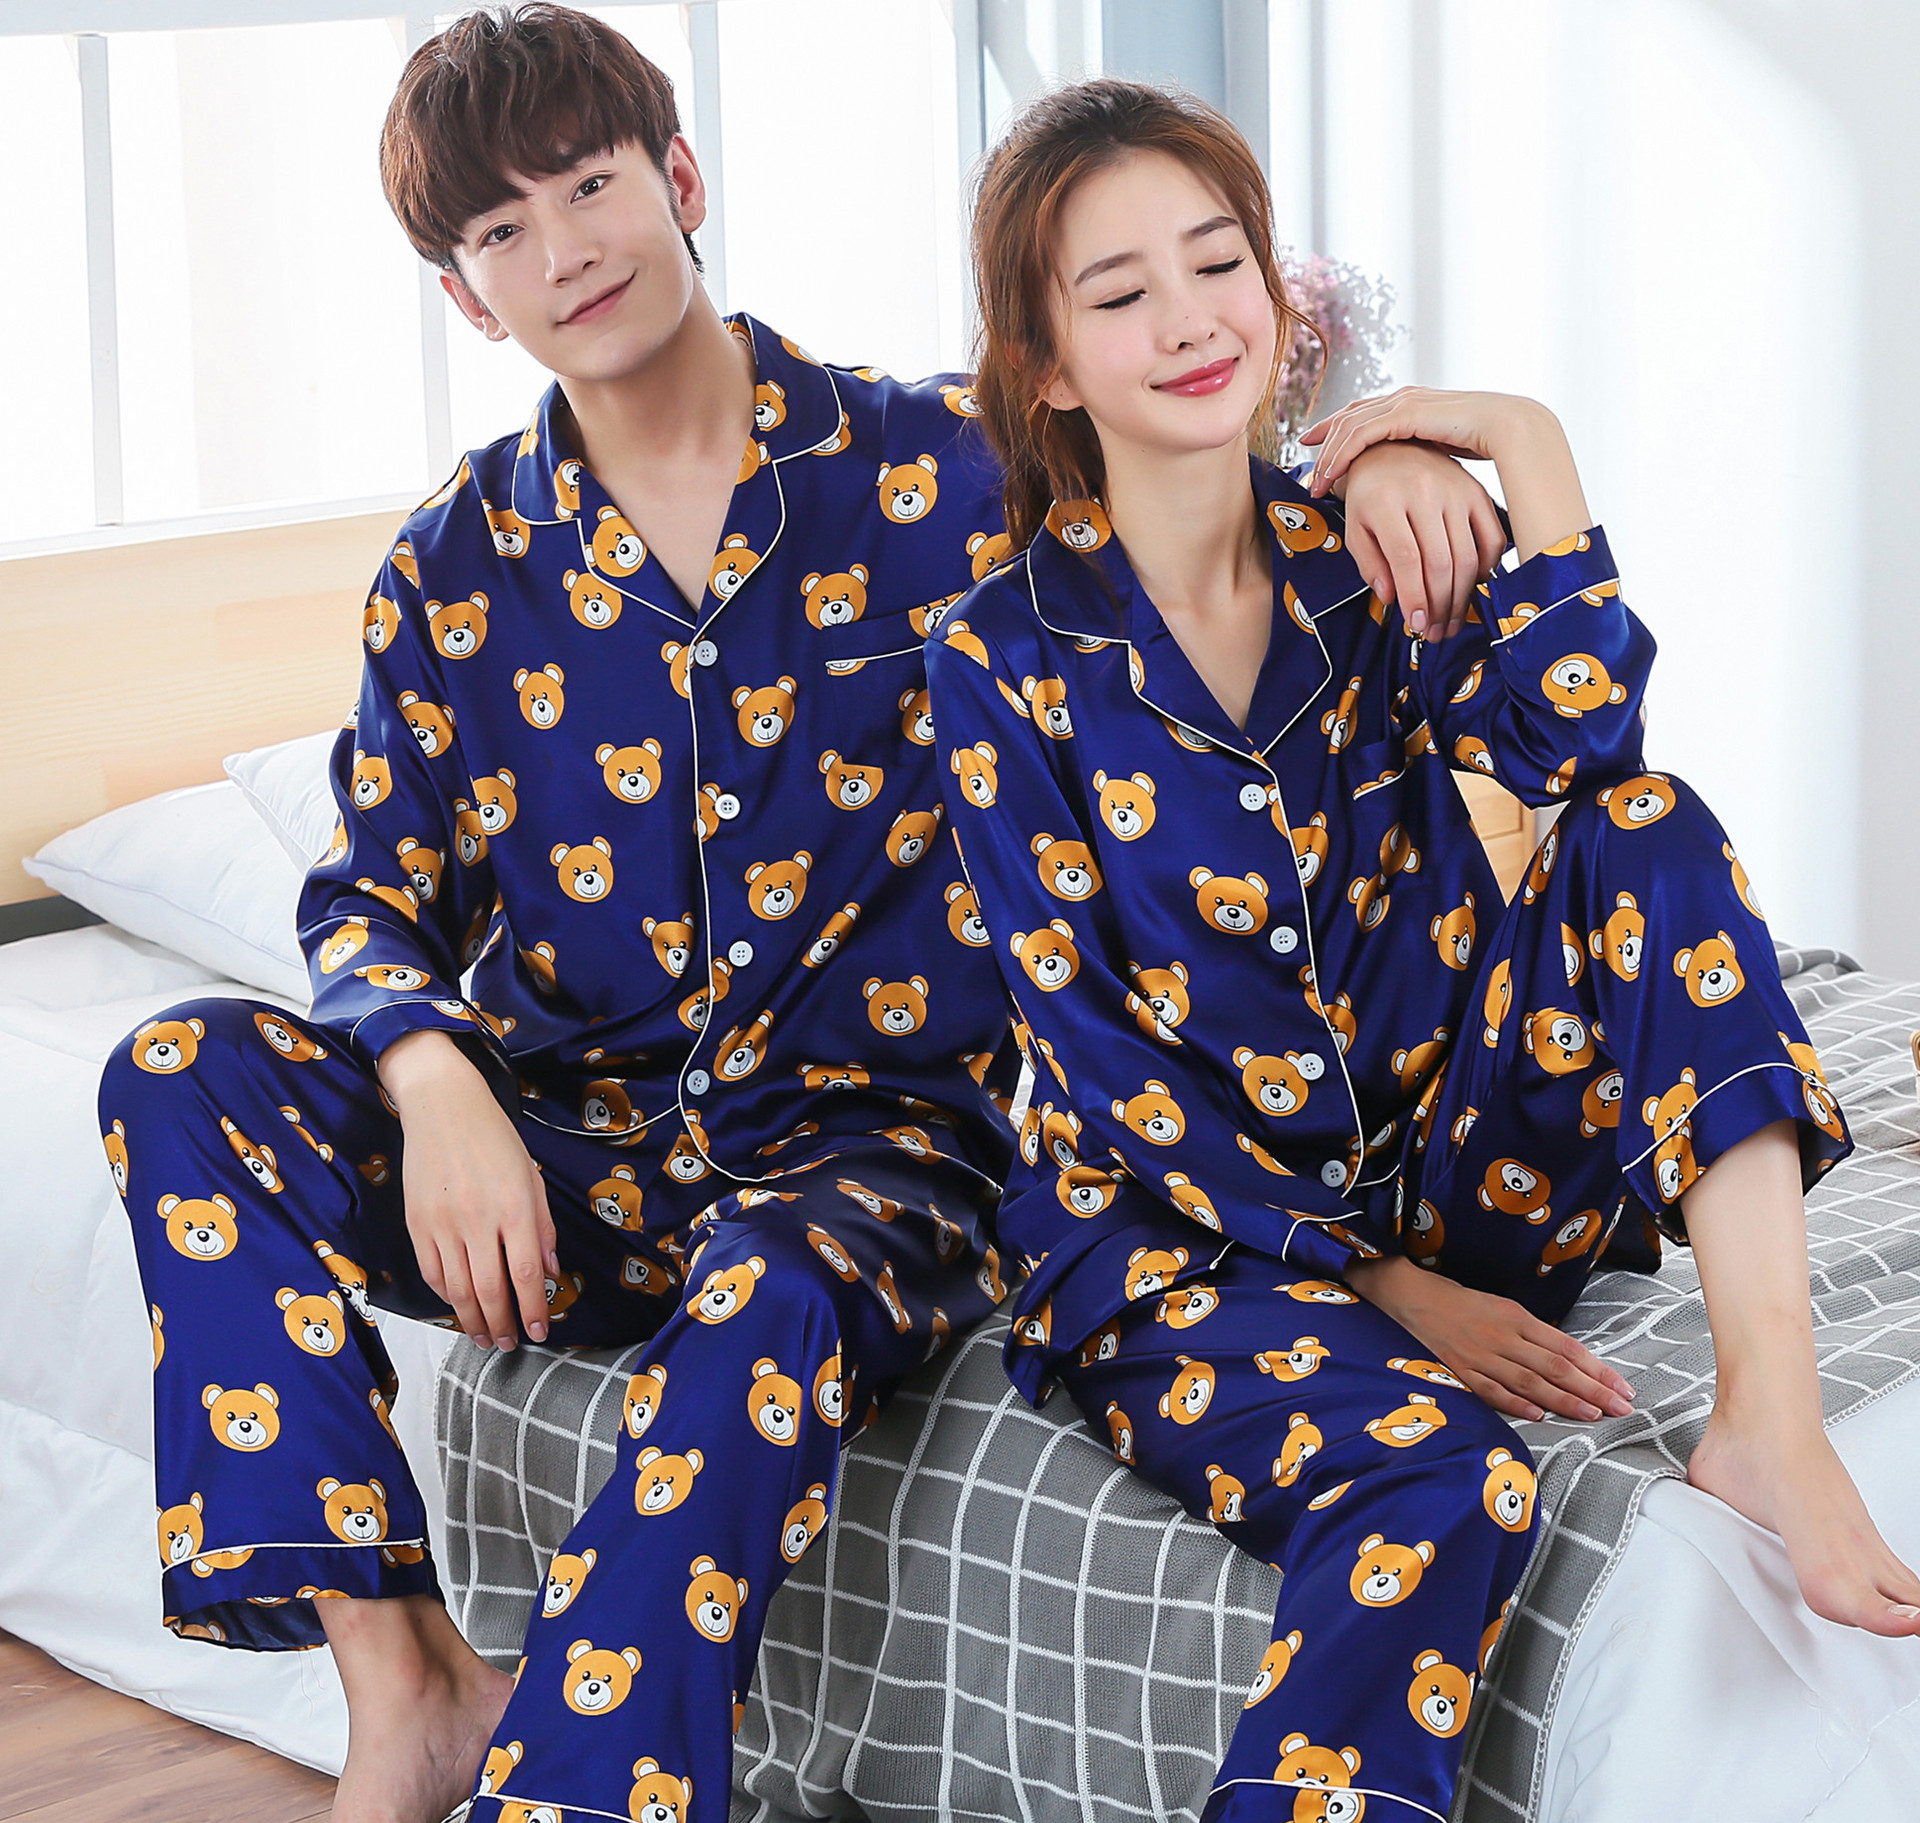 Image 3 - BZEL Sleepwear Women's Couple Pajamas Pijamas Women Satin Pyjama Woman Home Wear Silk Pyjama Set Home Suit Big Size Dropshipping-in Pajama Sets from Underwear & Sleepwears